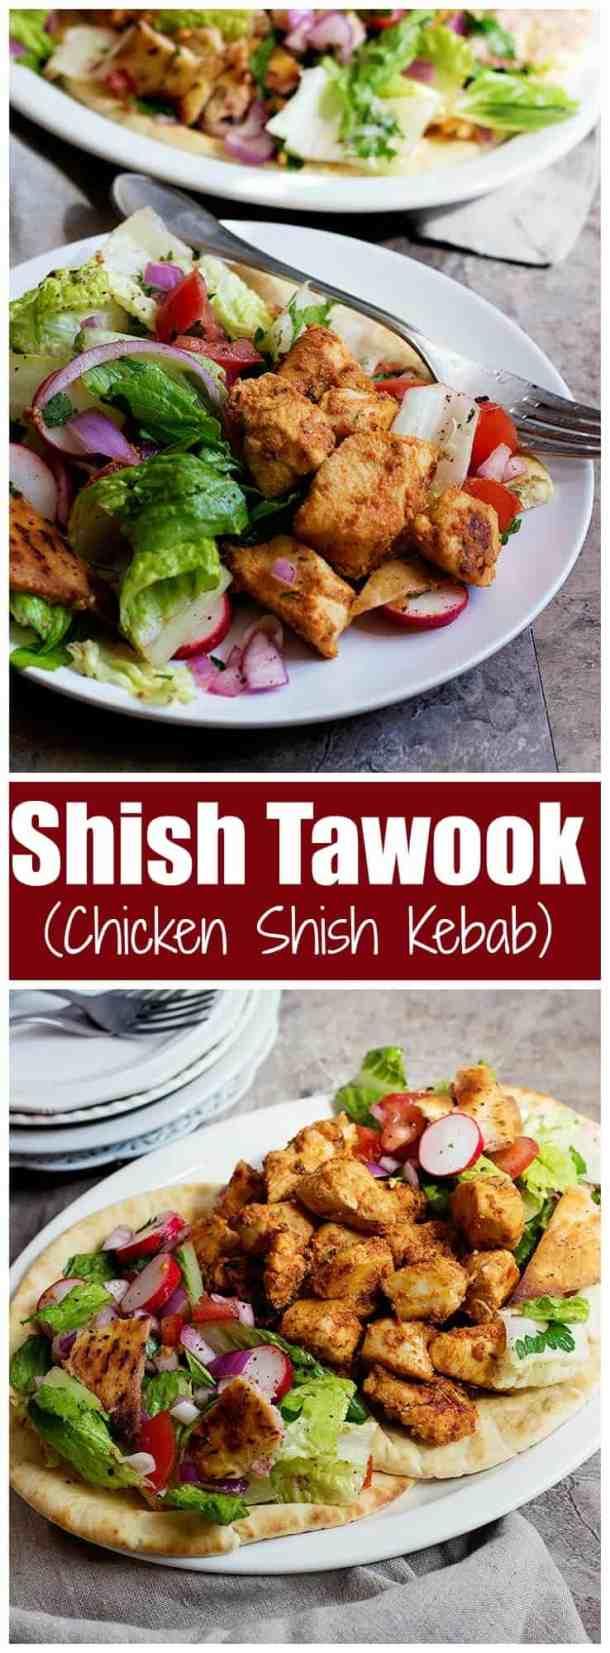 Chicken Taouk Marinade